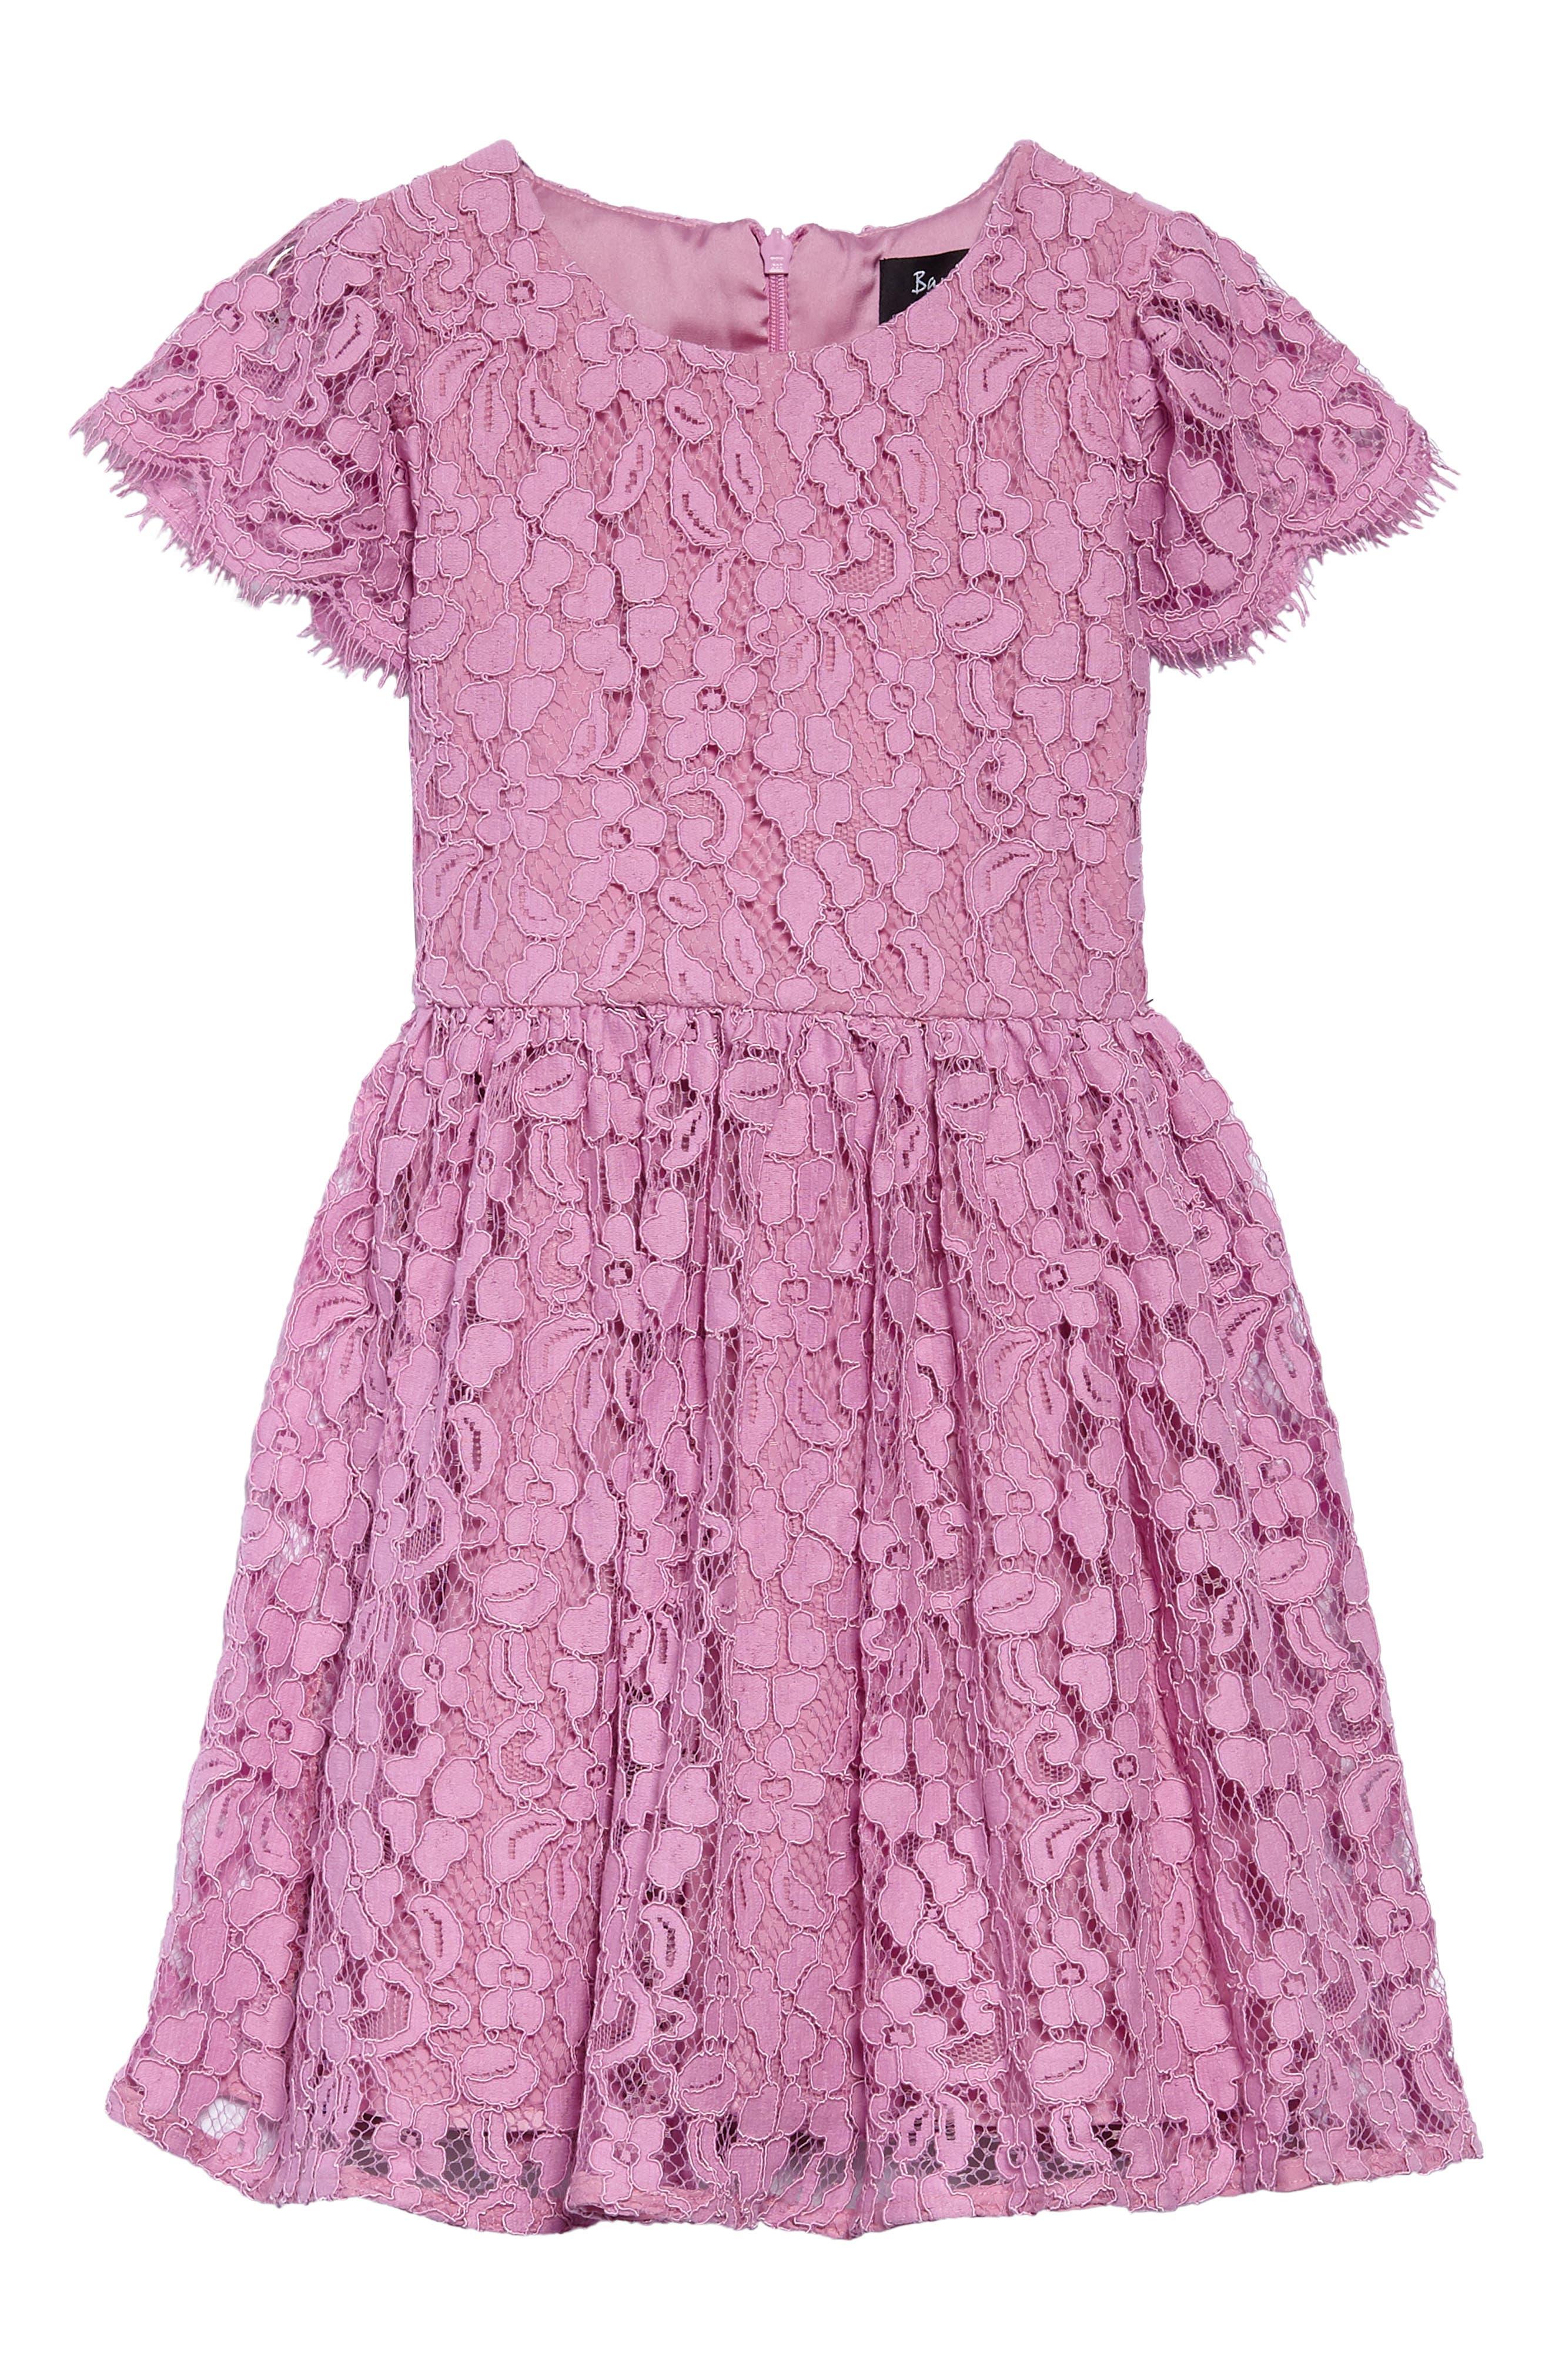 Sienna Floral Lace Dress,                             Main thumbnail 1, color,                             650